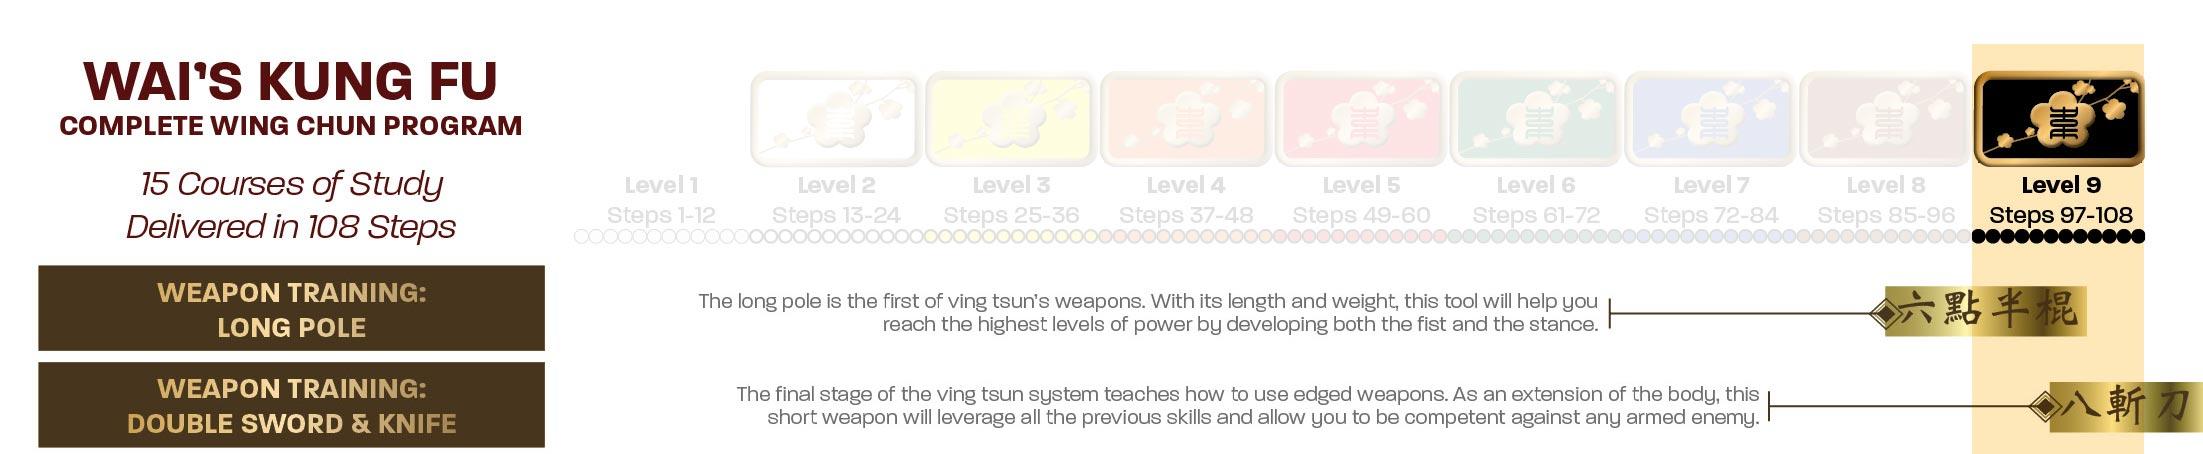 Level 9 Courses